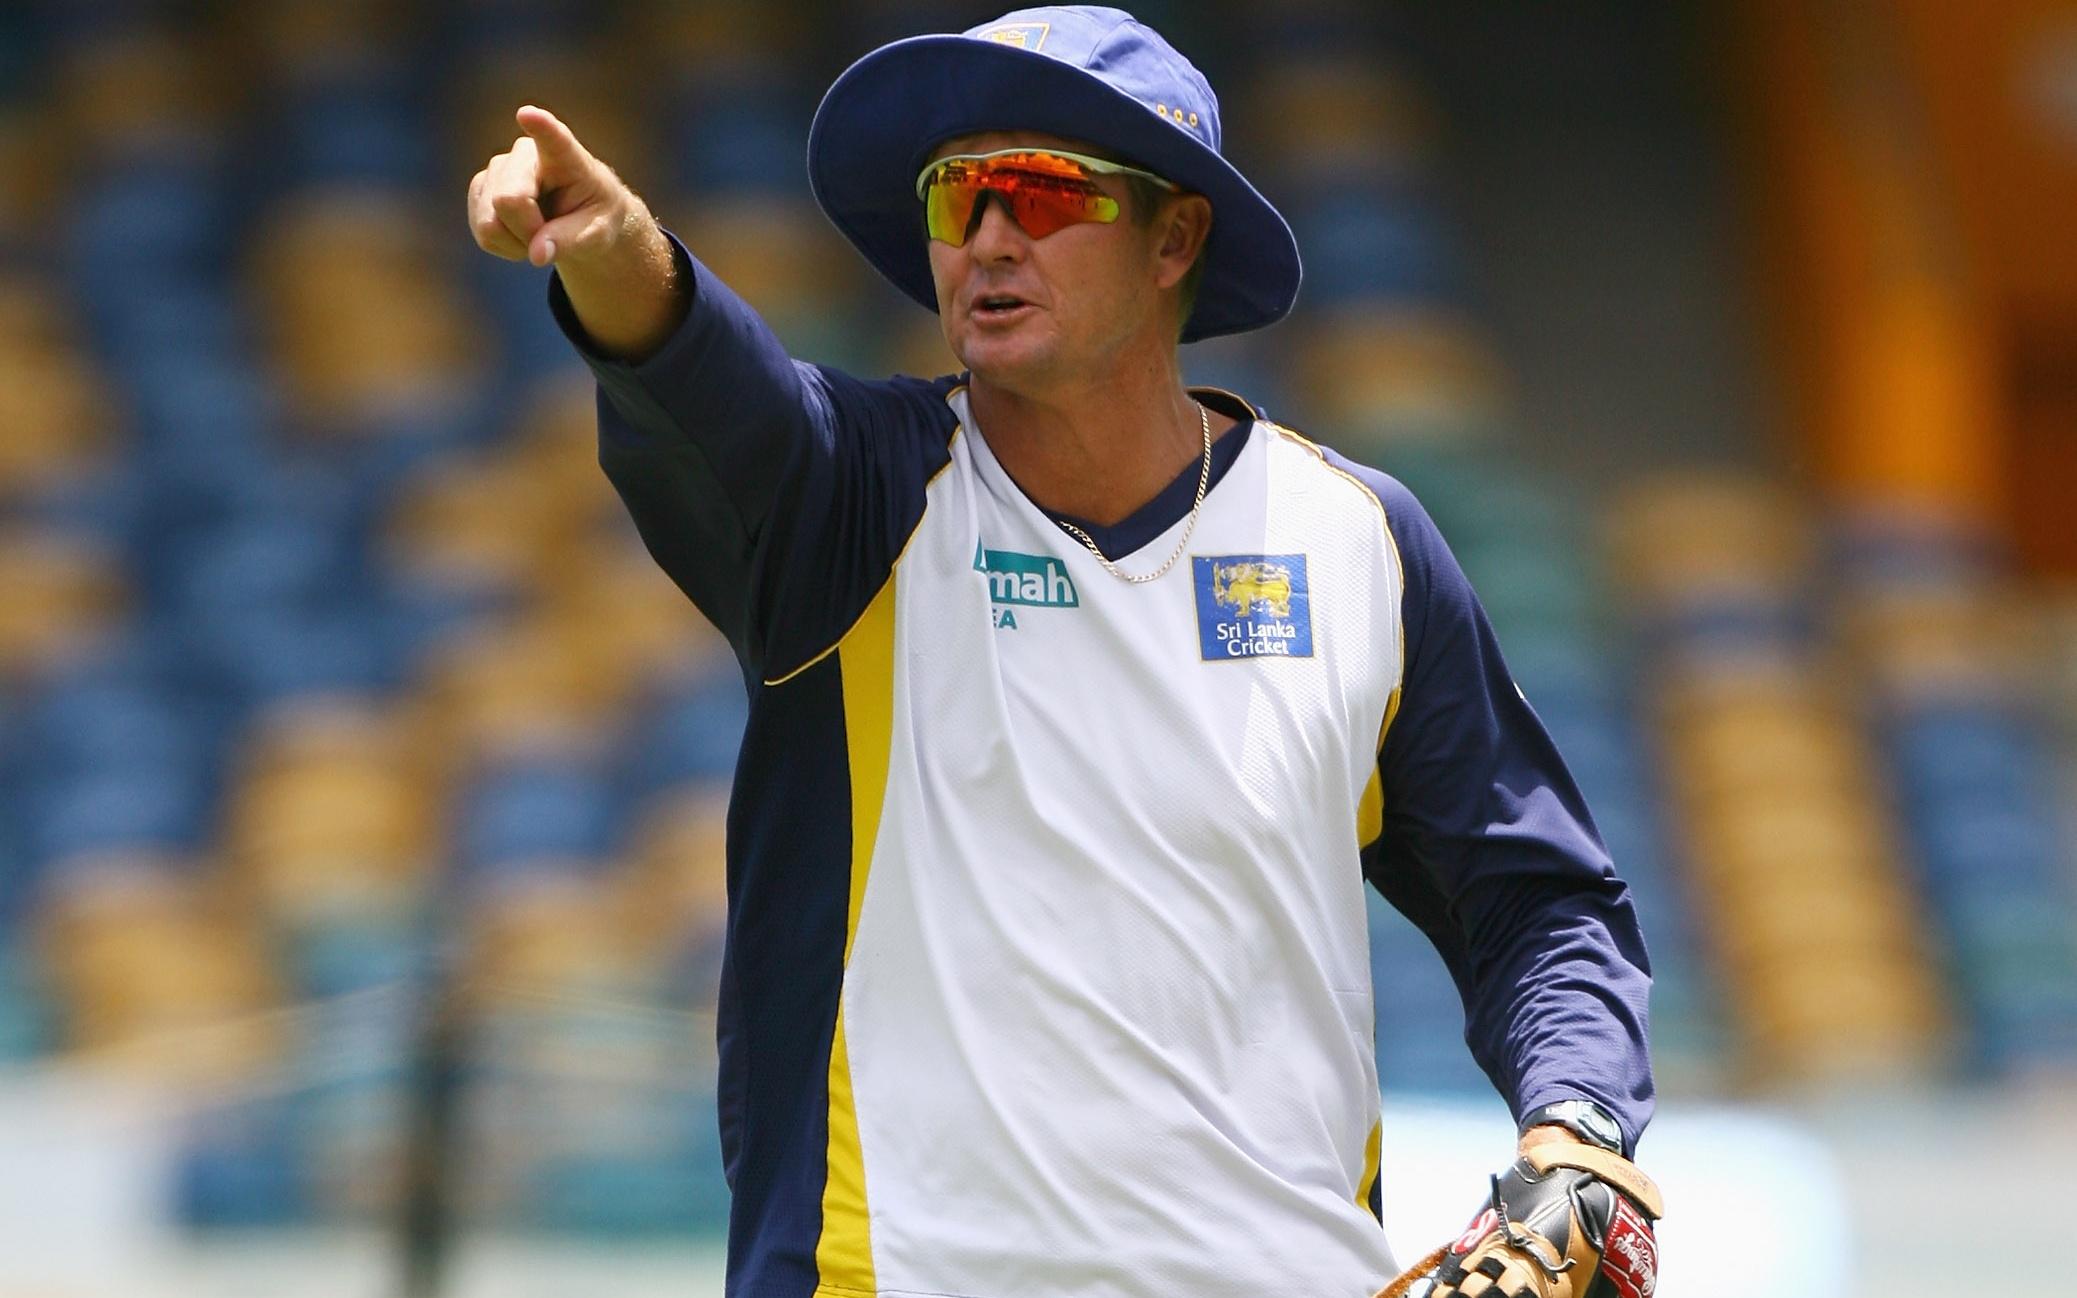 Zim Cricket Coach Trevor Penny Gets IPL Coaching Role